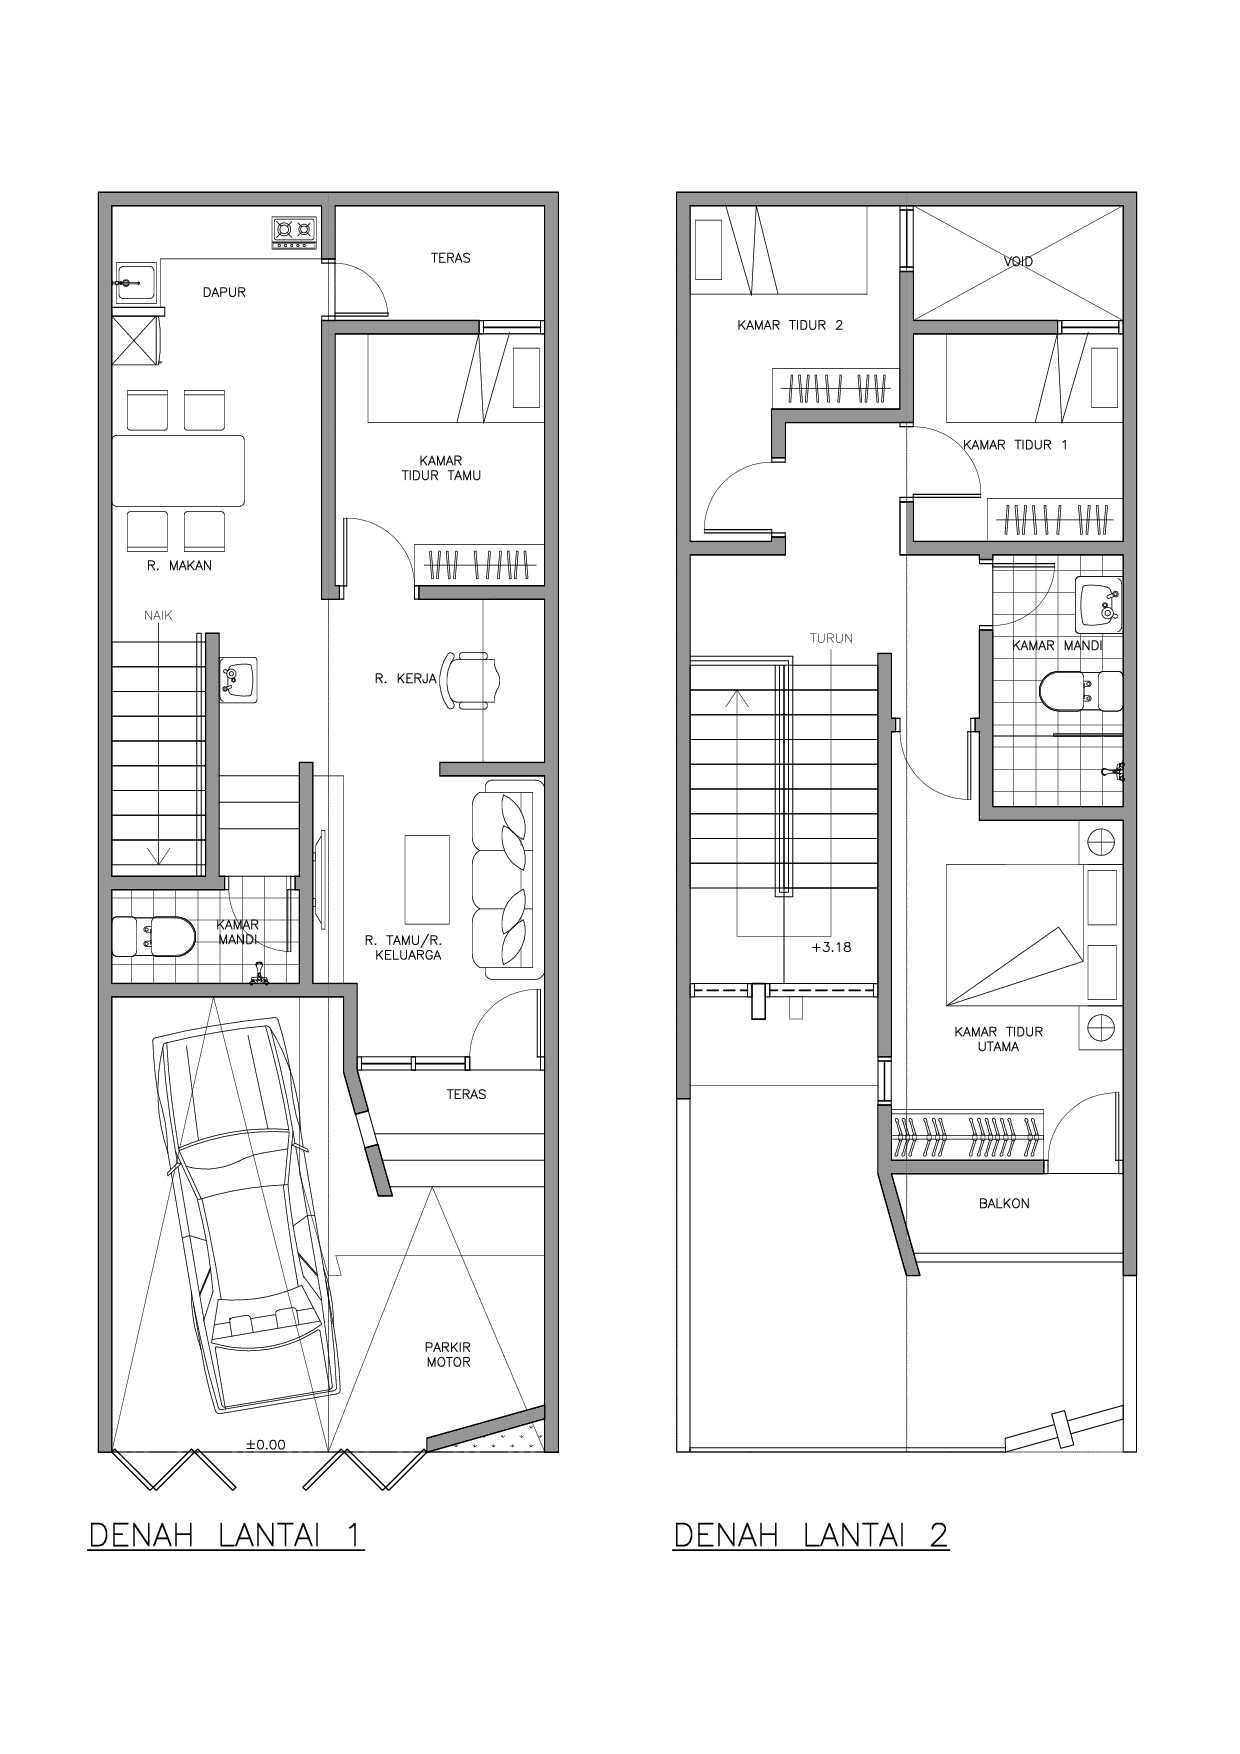 David Atmacendana Str|P House Rawa Kepa 4, Tomang, West Jakarta Rawa Kepa 4, Tomang, West Jakarta Dtp-Fix-Model-1   18546